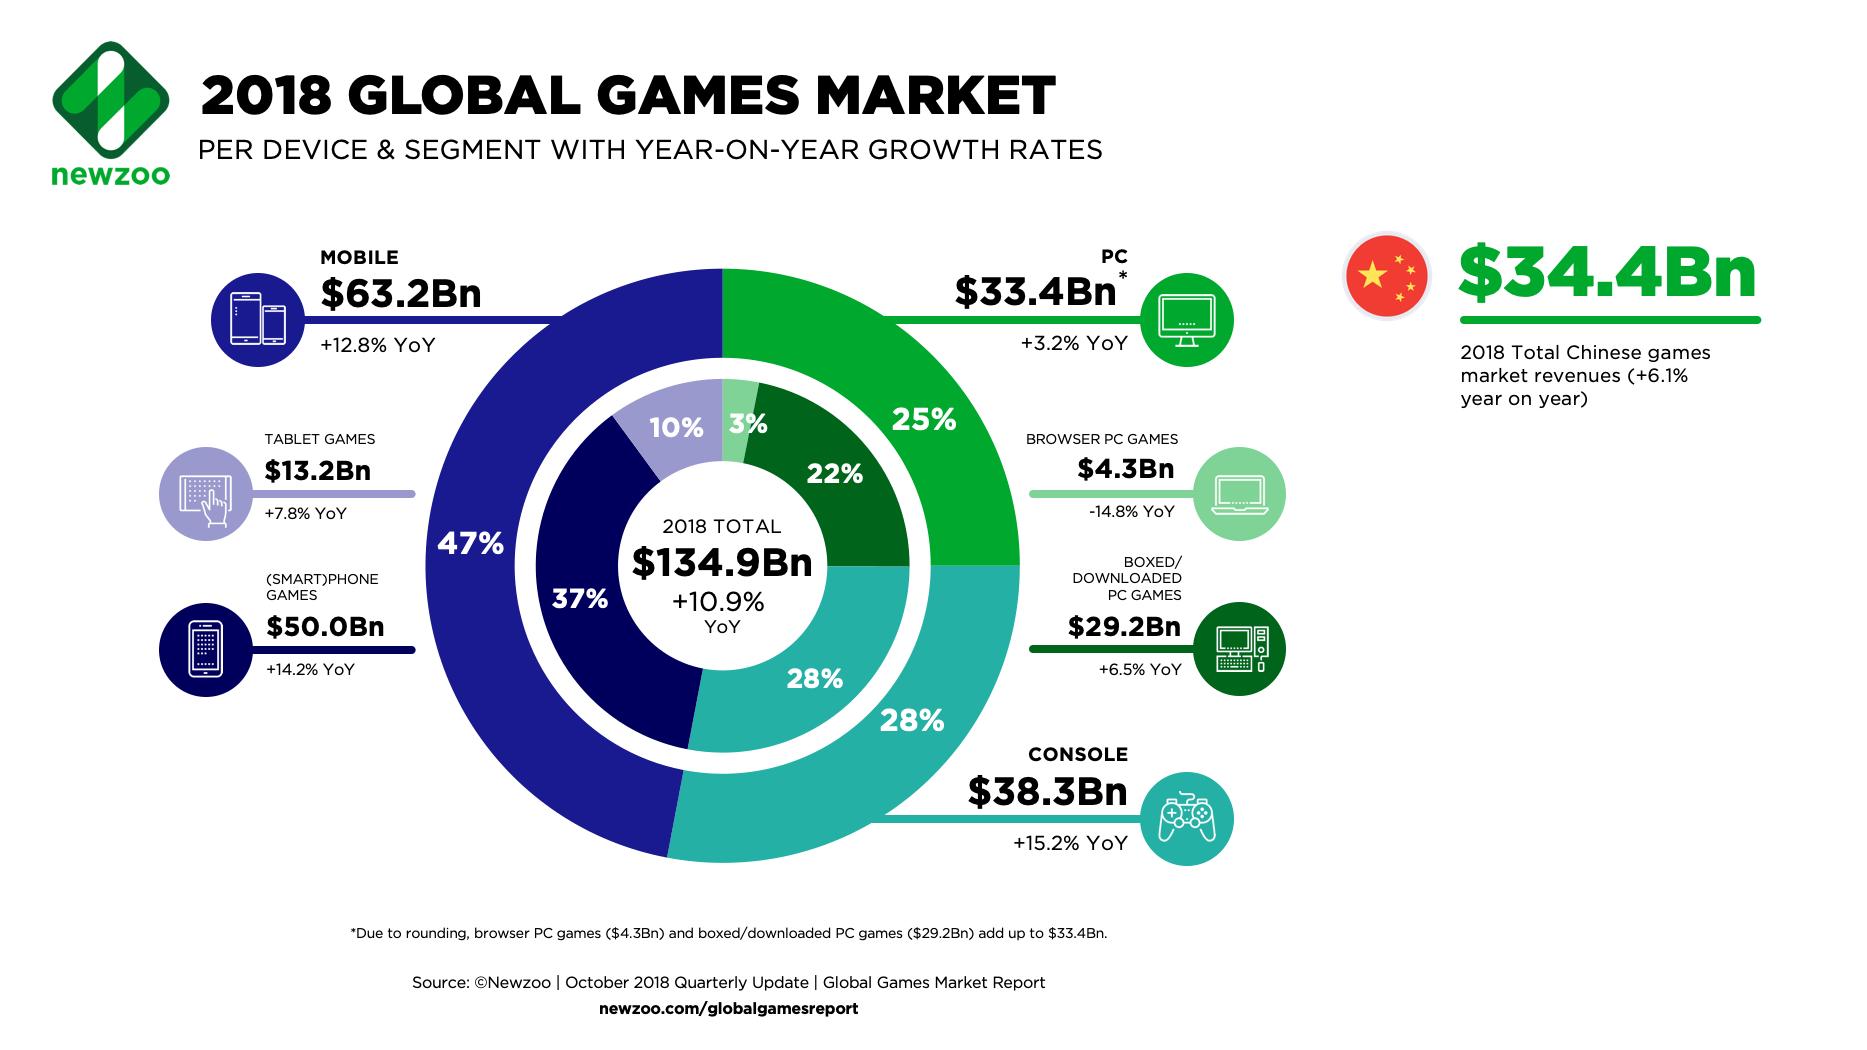 2018 Global Games Market Newzoo infographic